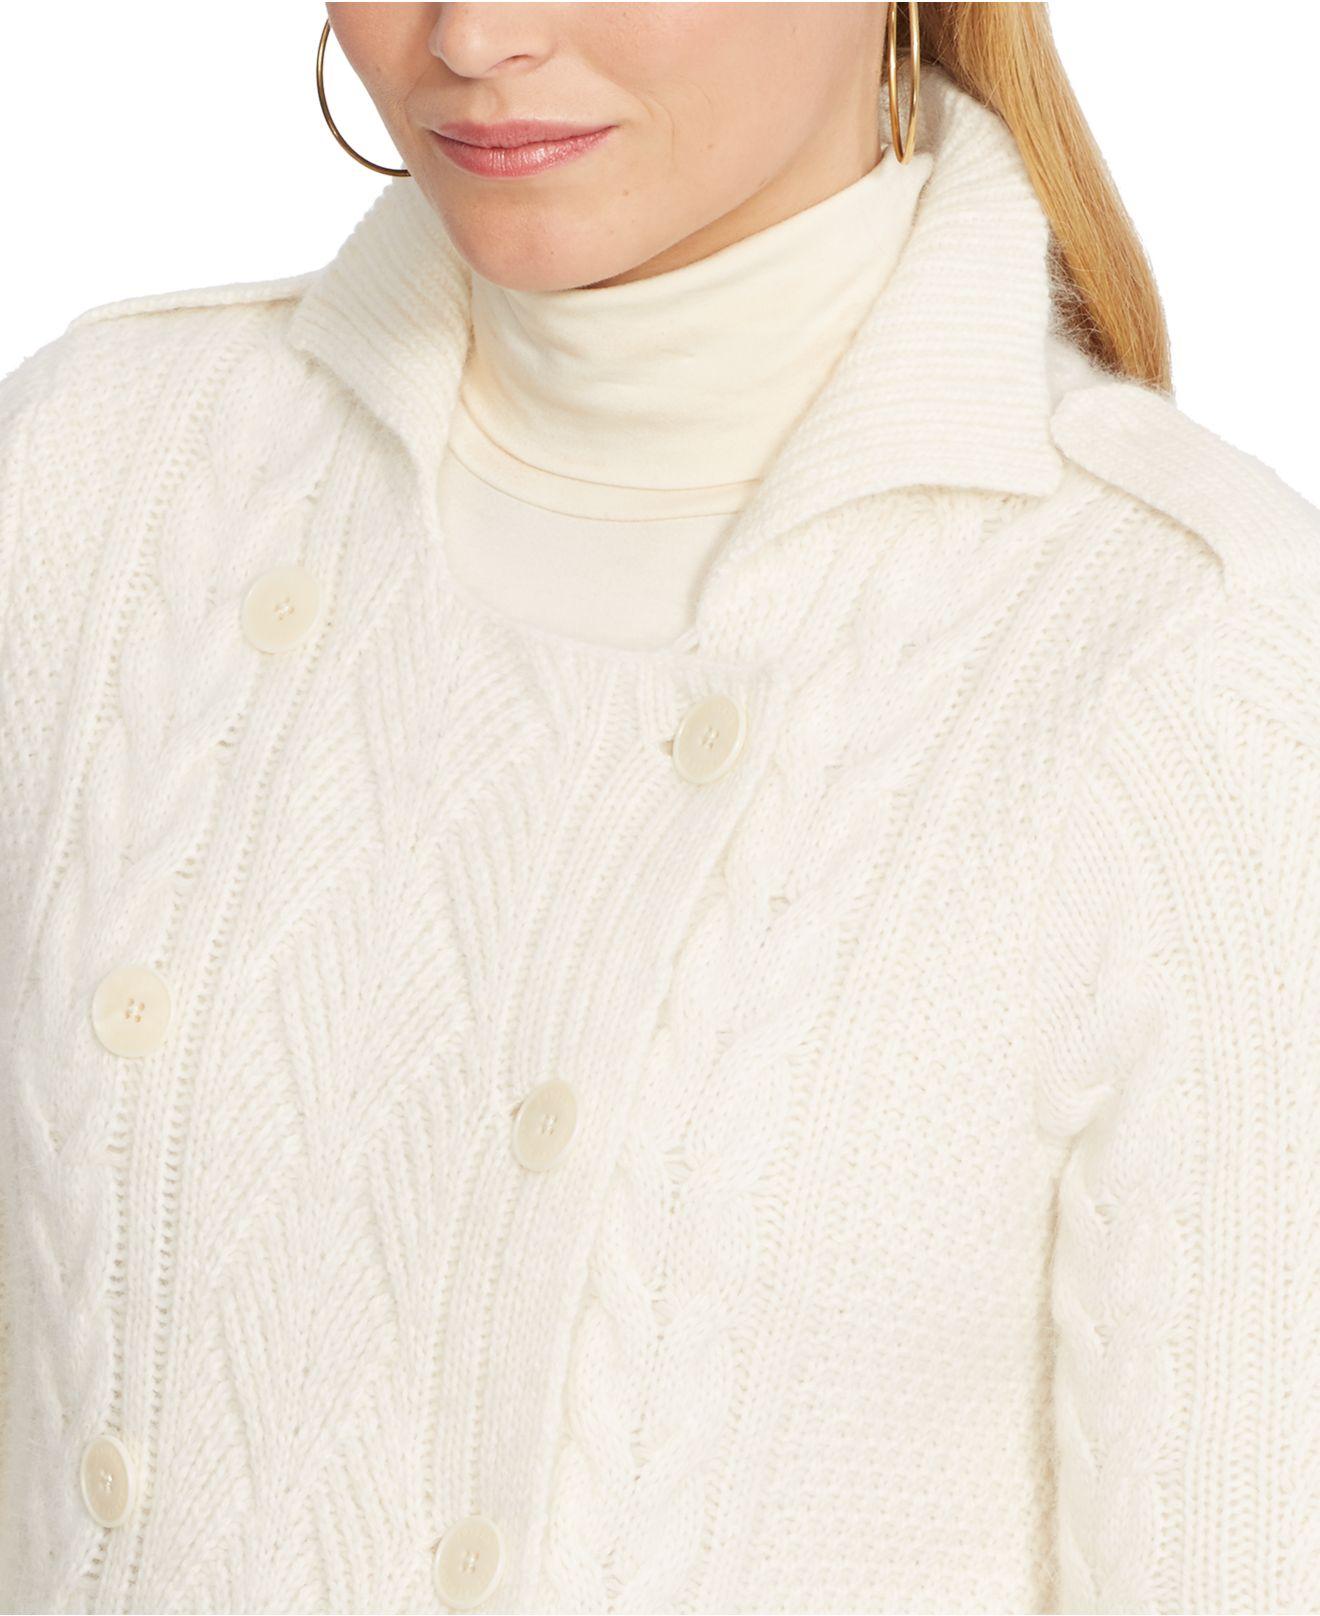 Lyst Lauren By Ralph Lauren Plus Size Cable Knit Sweater Coat In